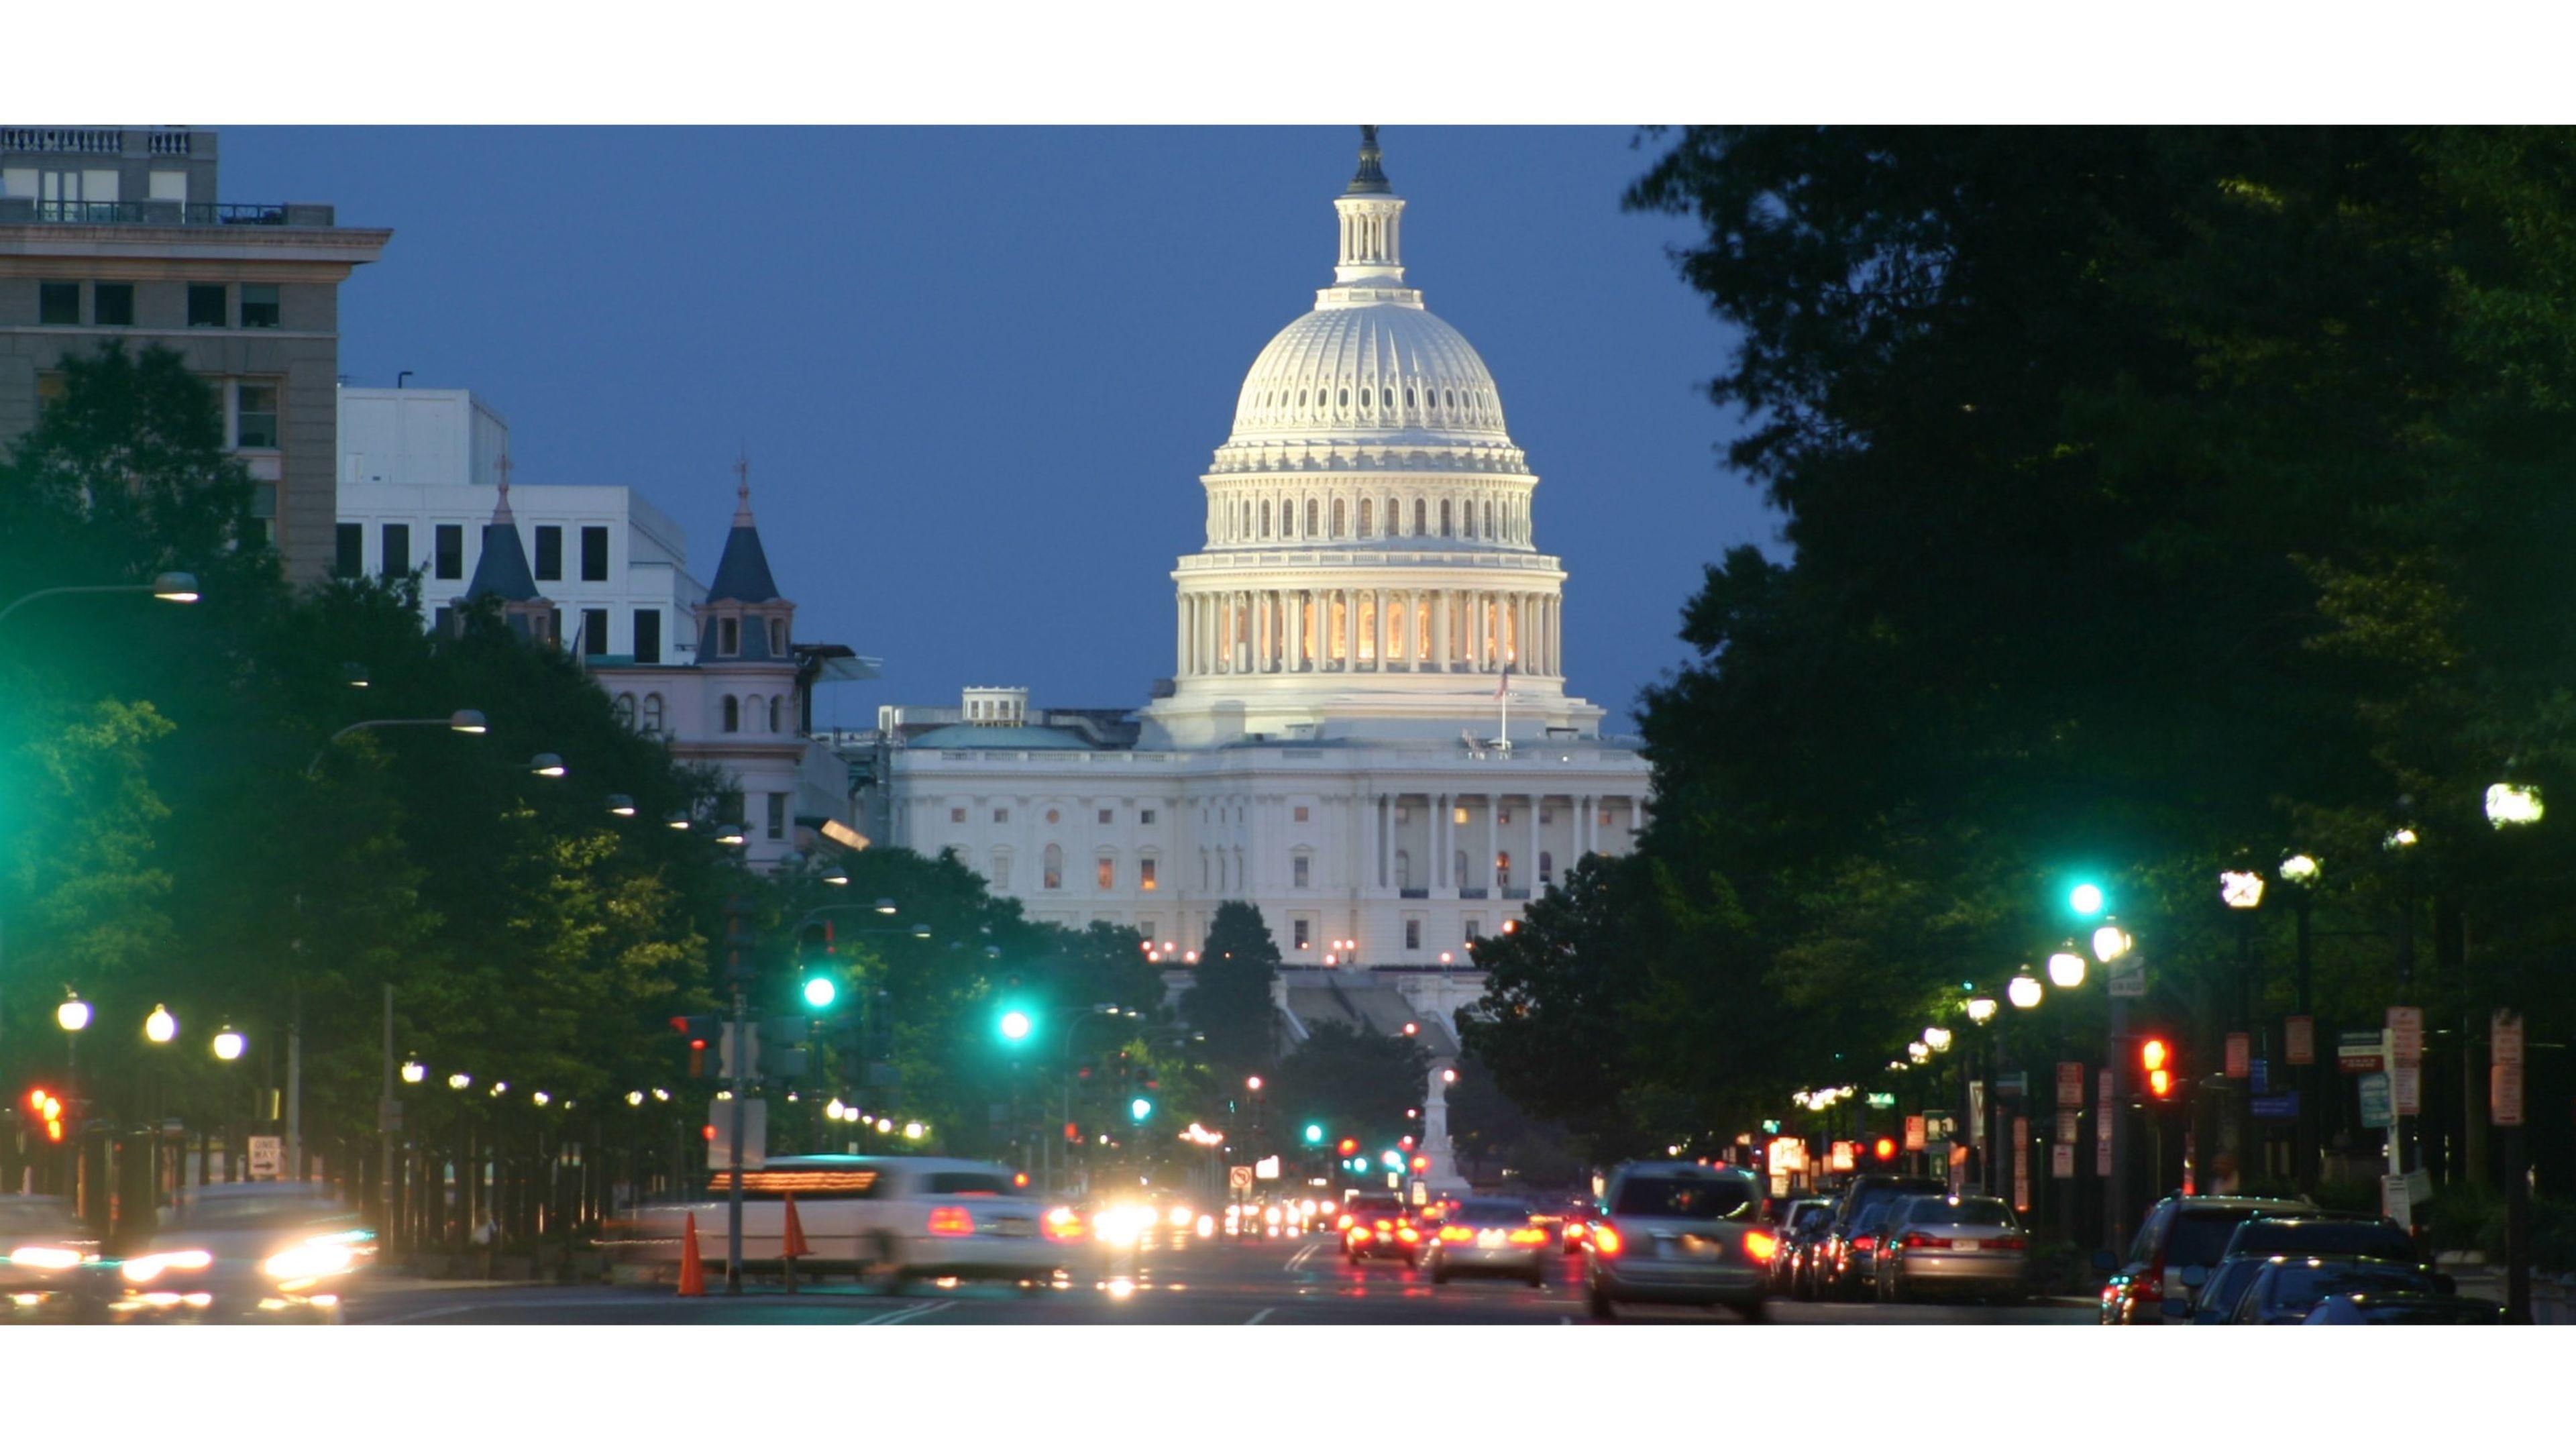 2940x2081 Washington DC Capitol Wallpaper